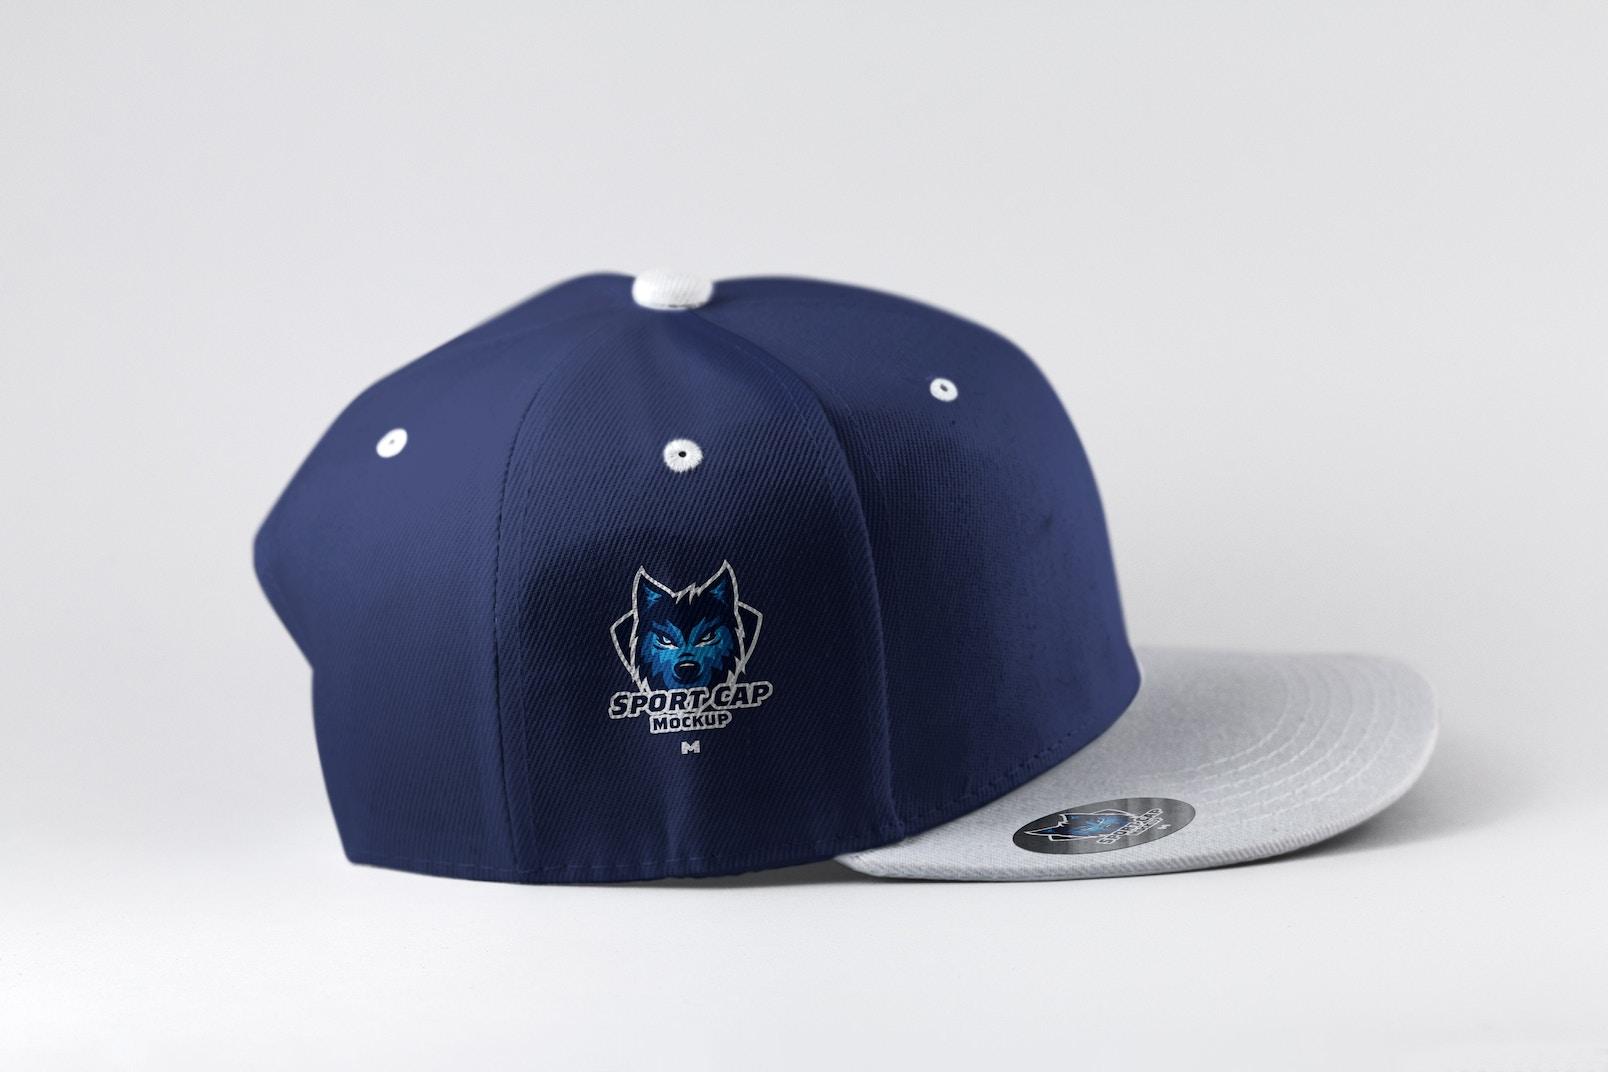 Sports Cap Side View Mockup 01